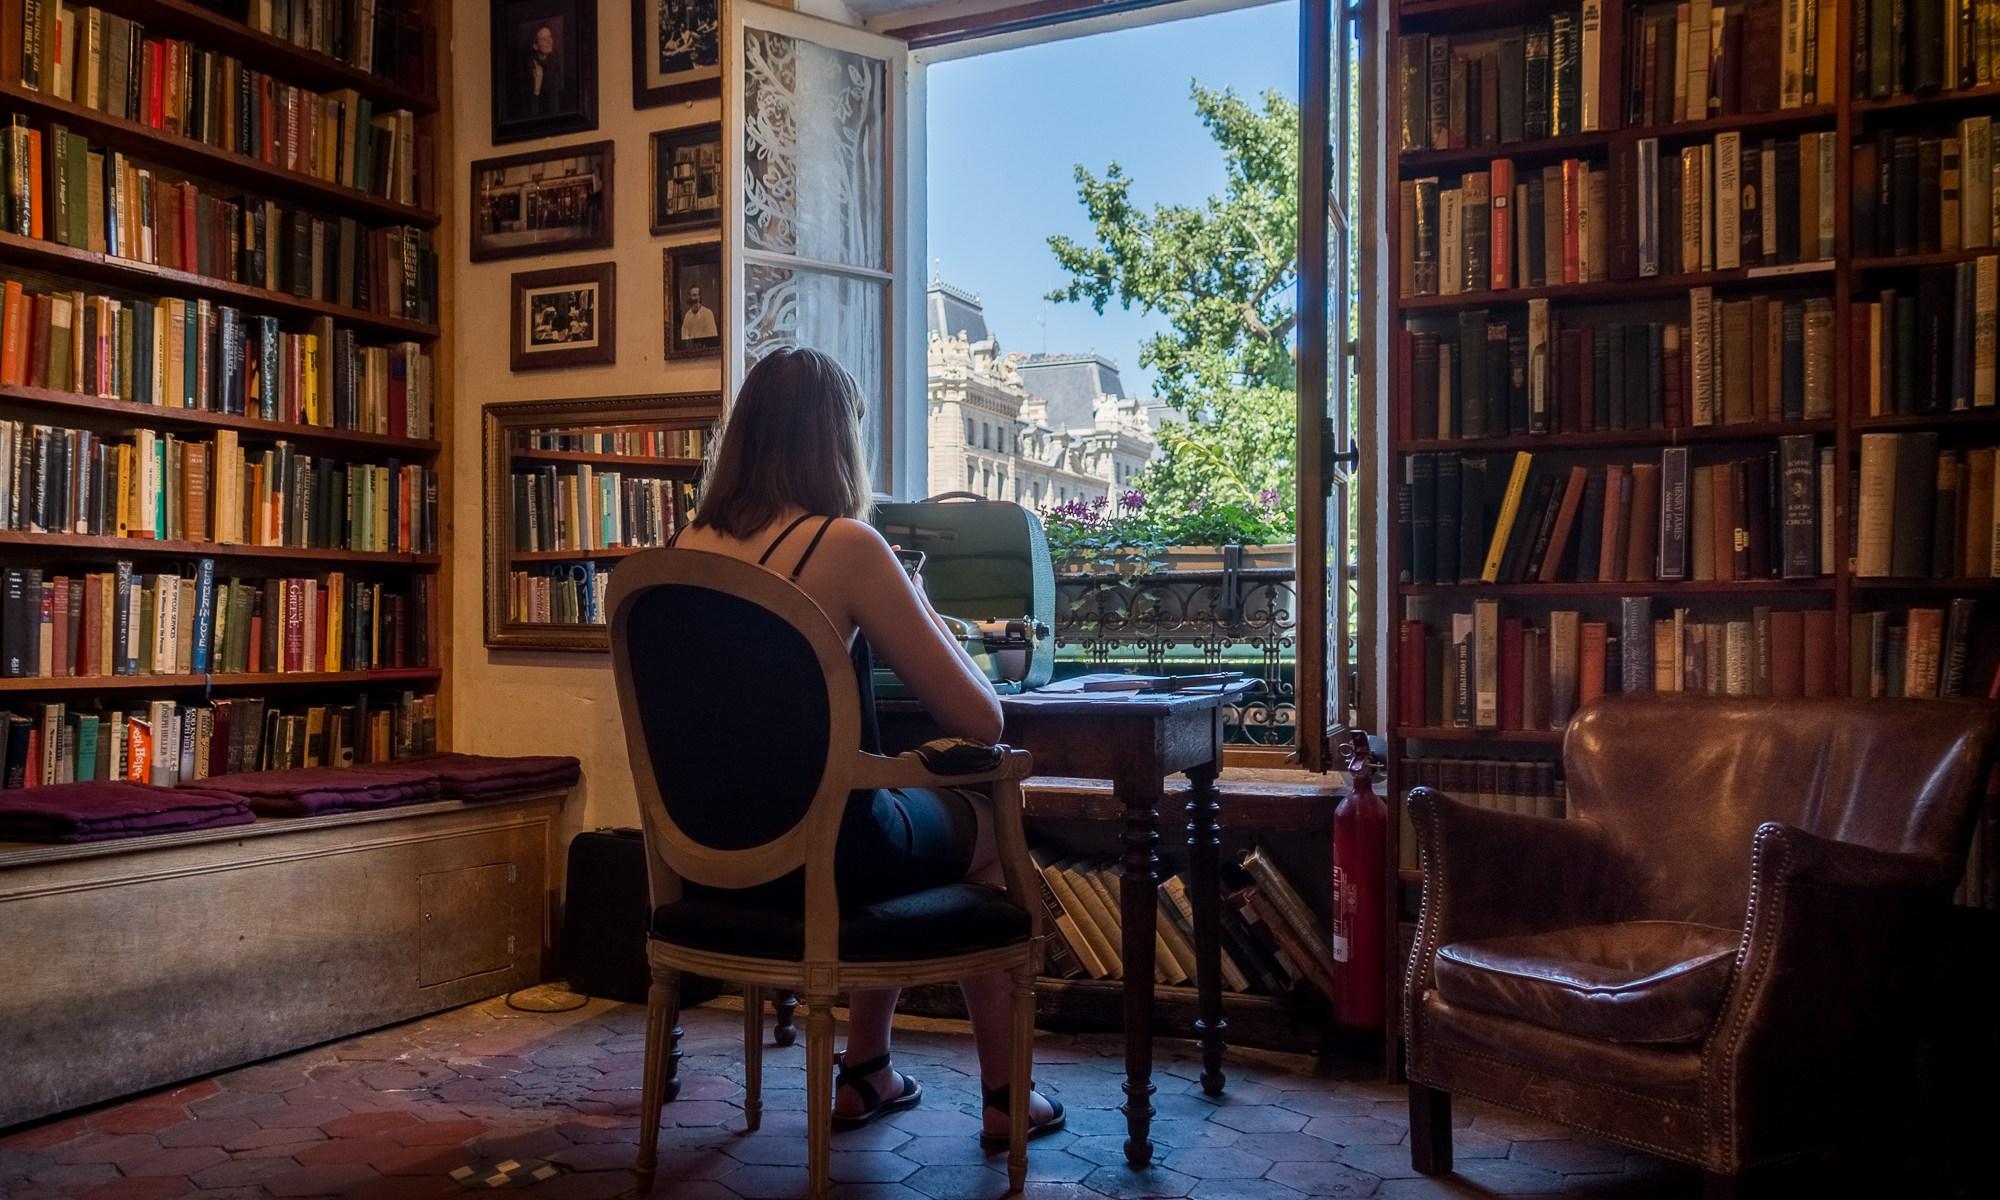 Inside Shakespeare and Company bookshop